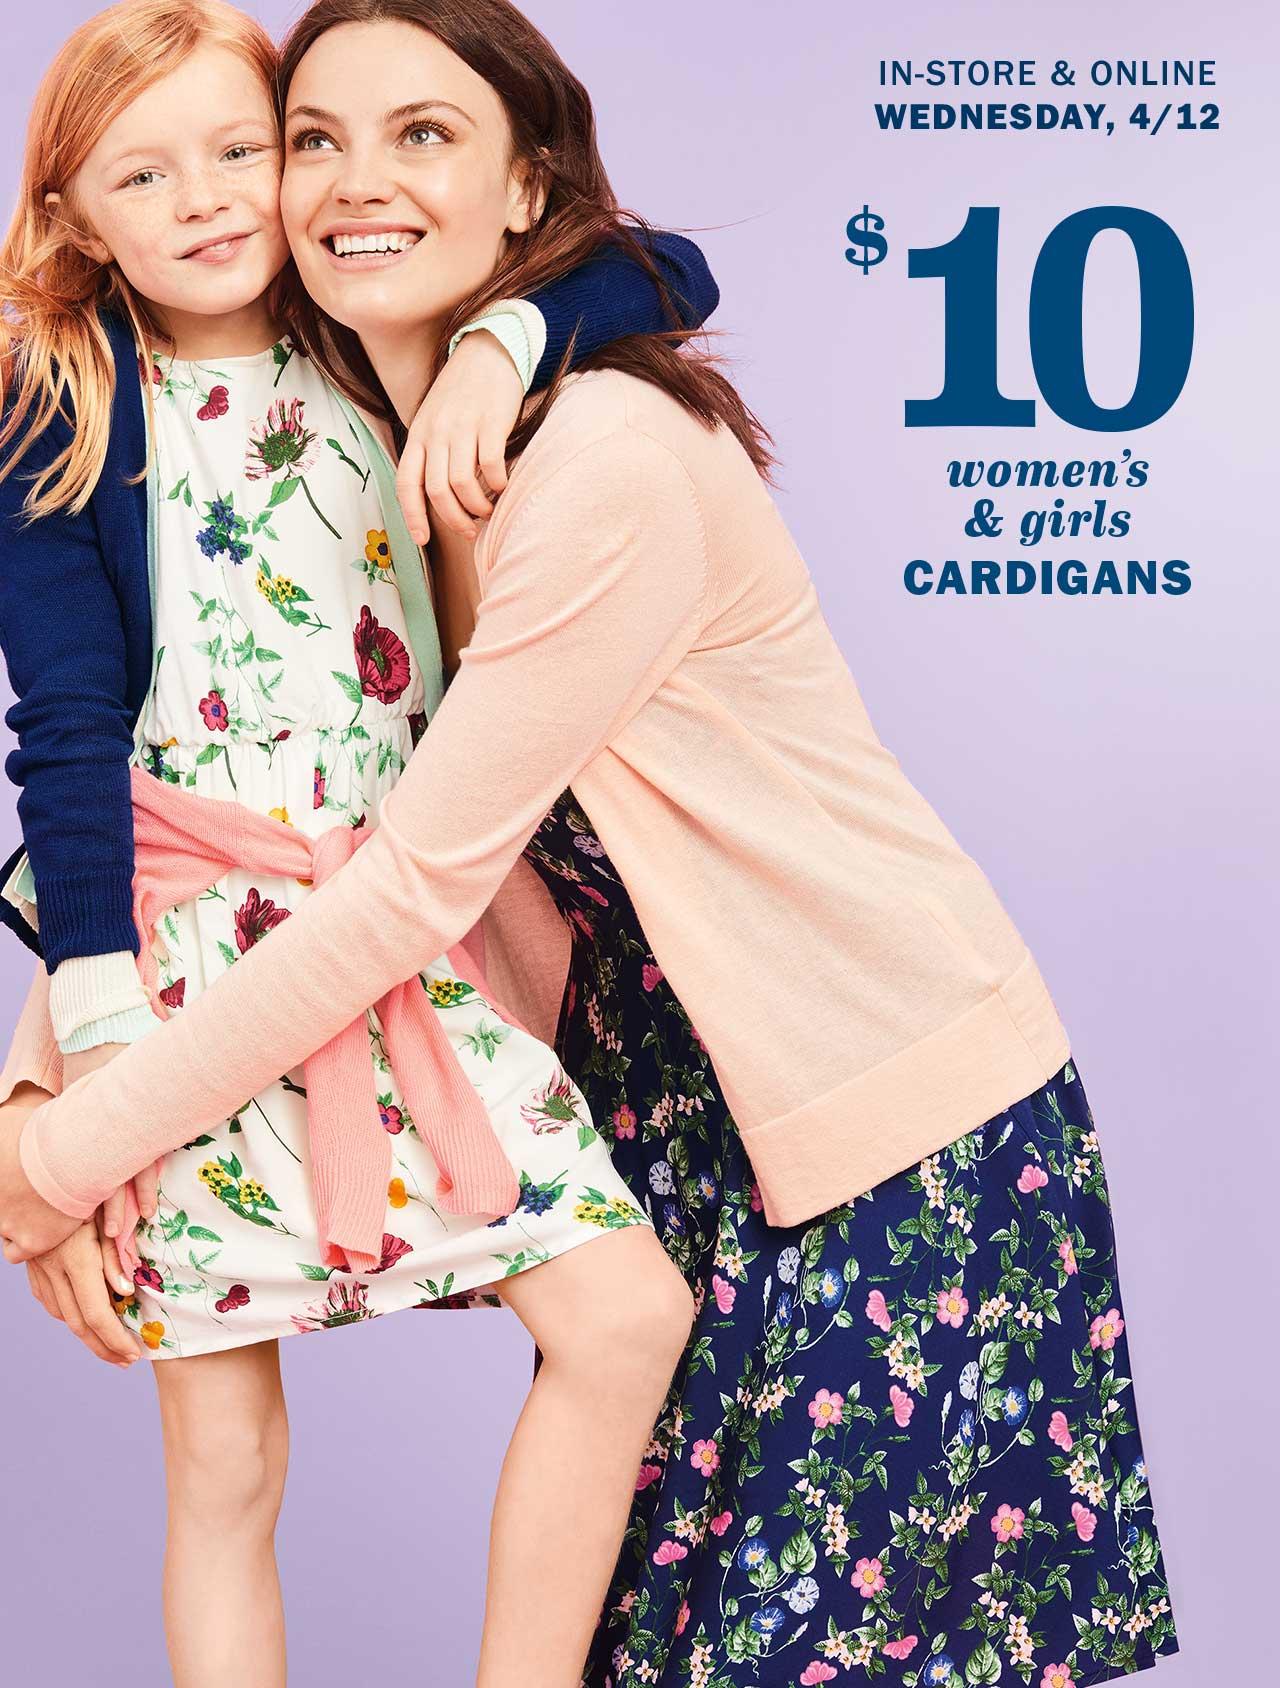 $10 women's & girls CARDIGANS